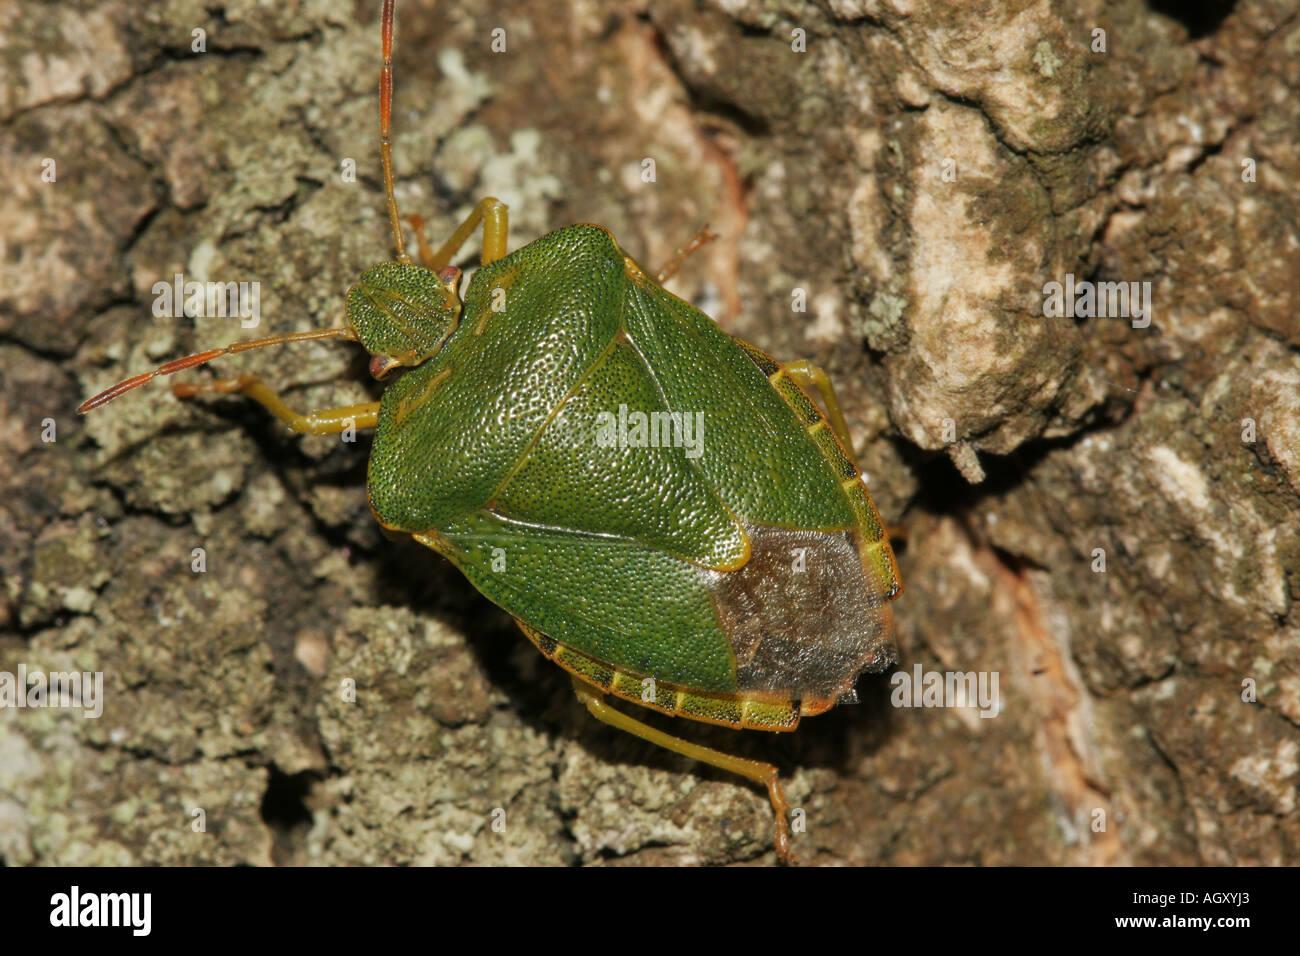 Green Sheild Bug Palomena prasina on Tree Bark - Stock Image